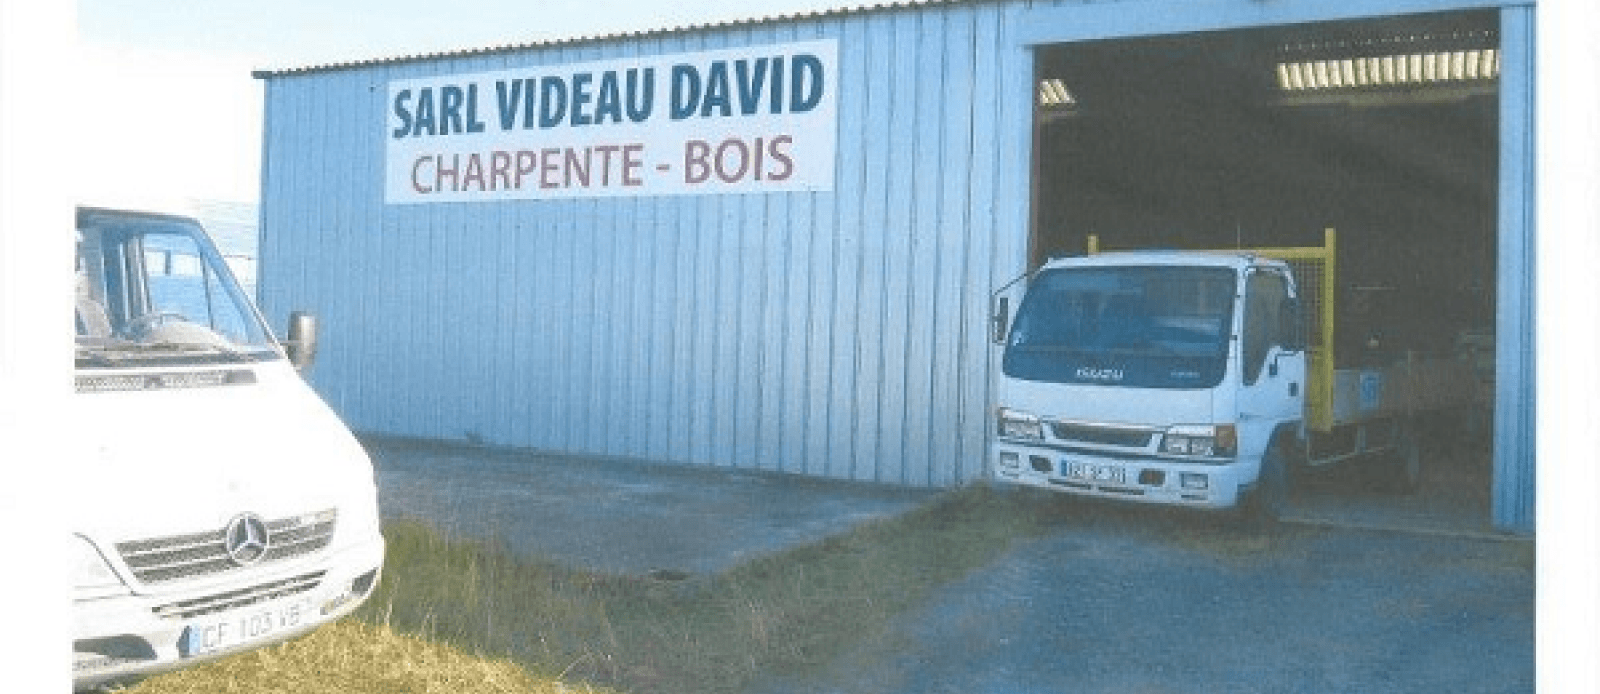 SARL Videau David - guide - Soulac